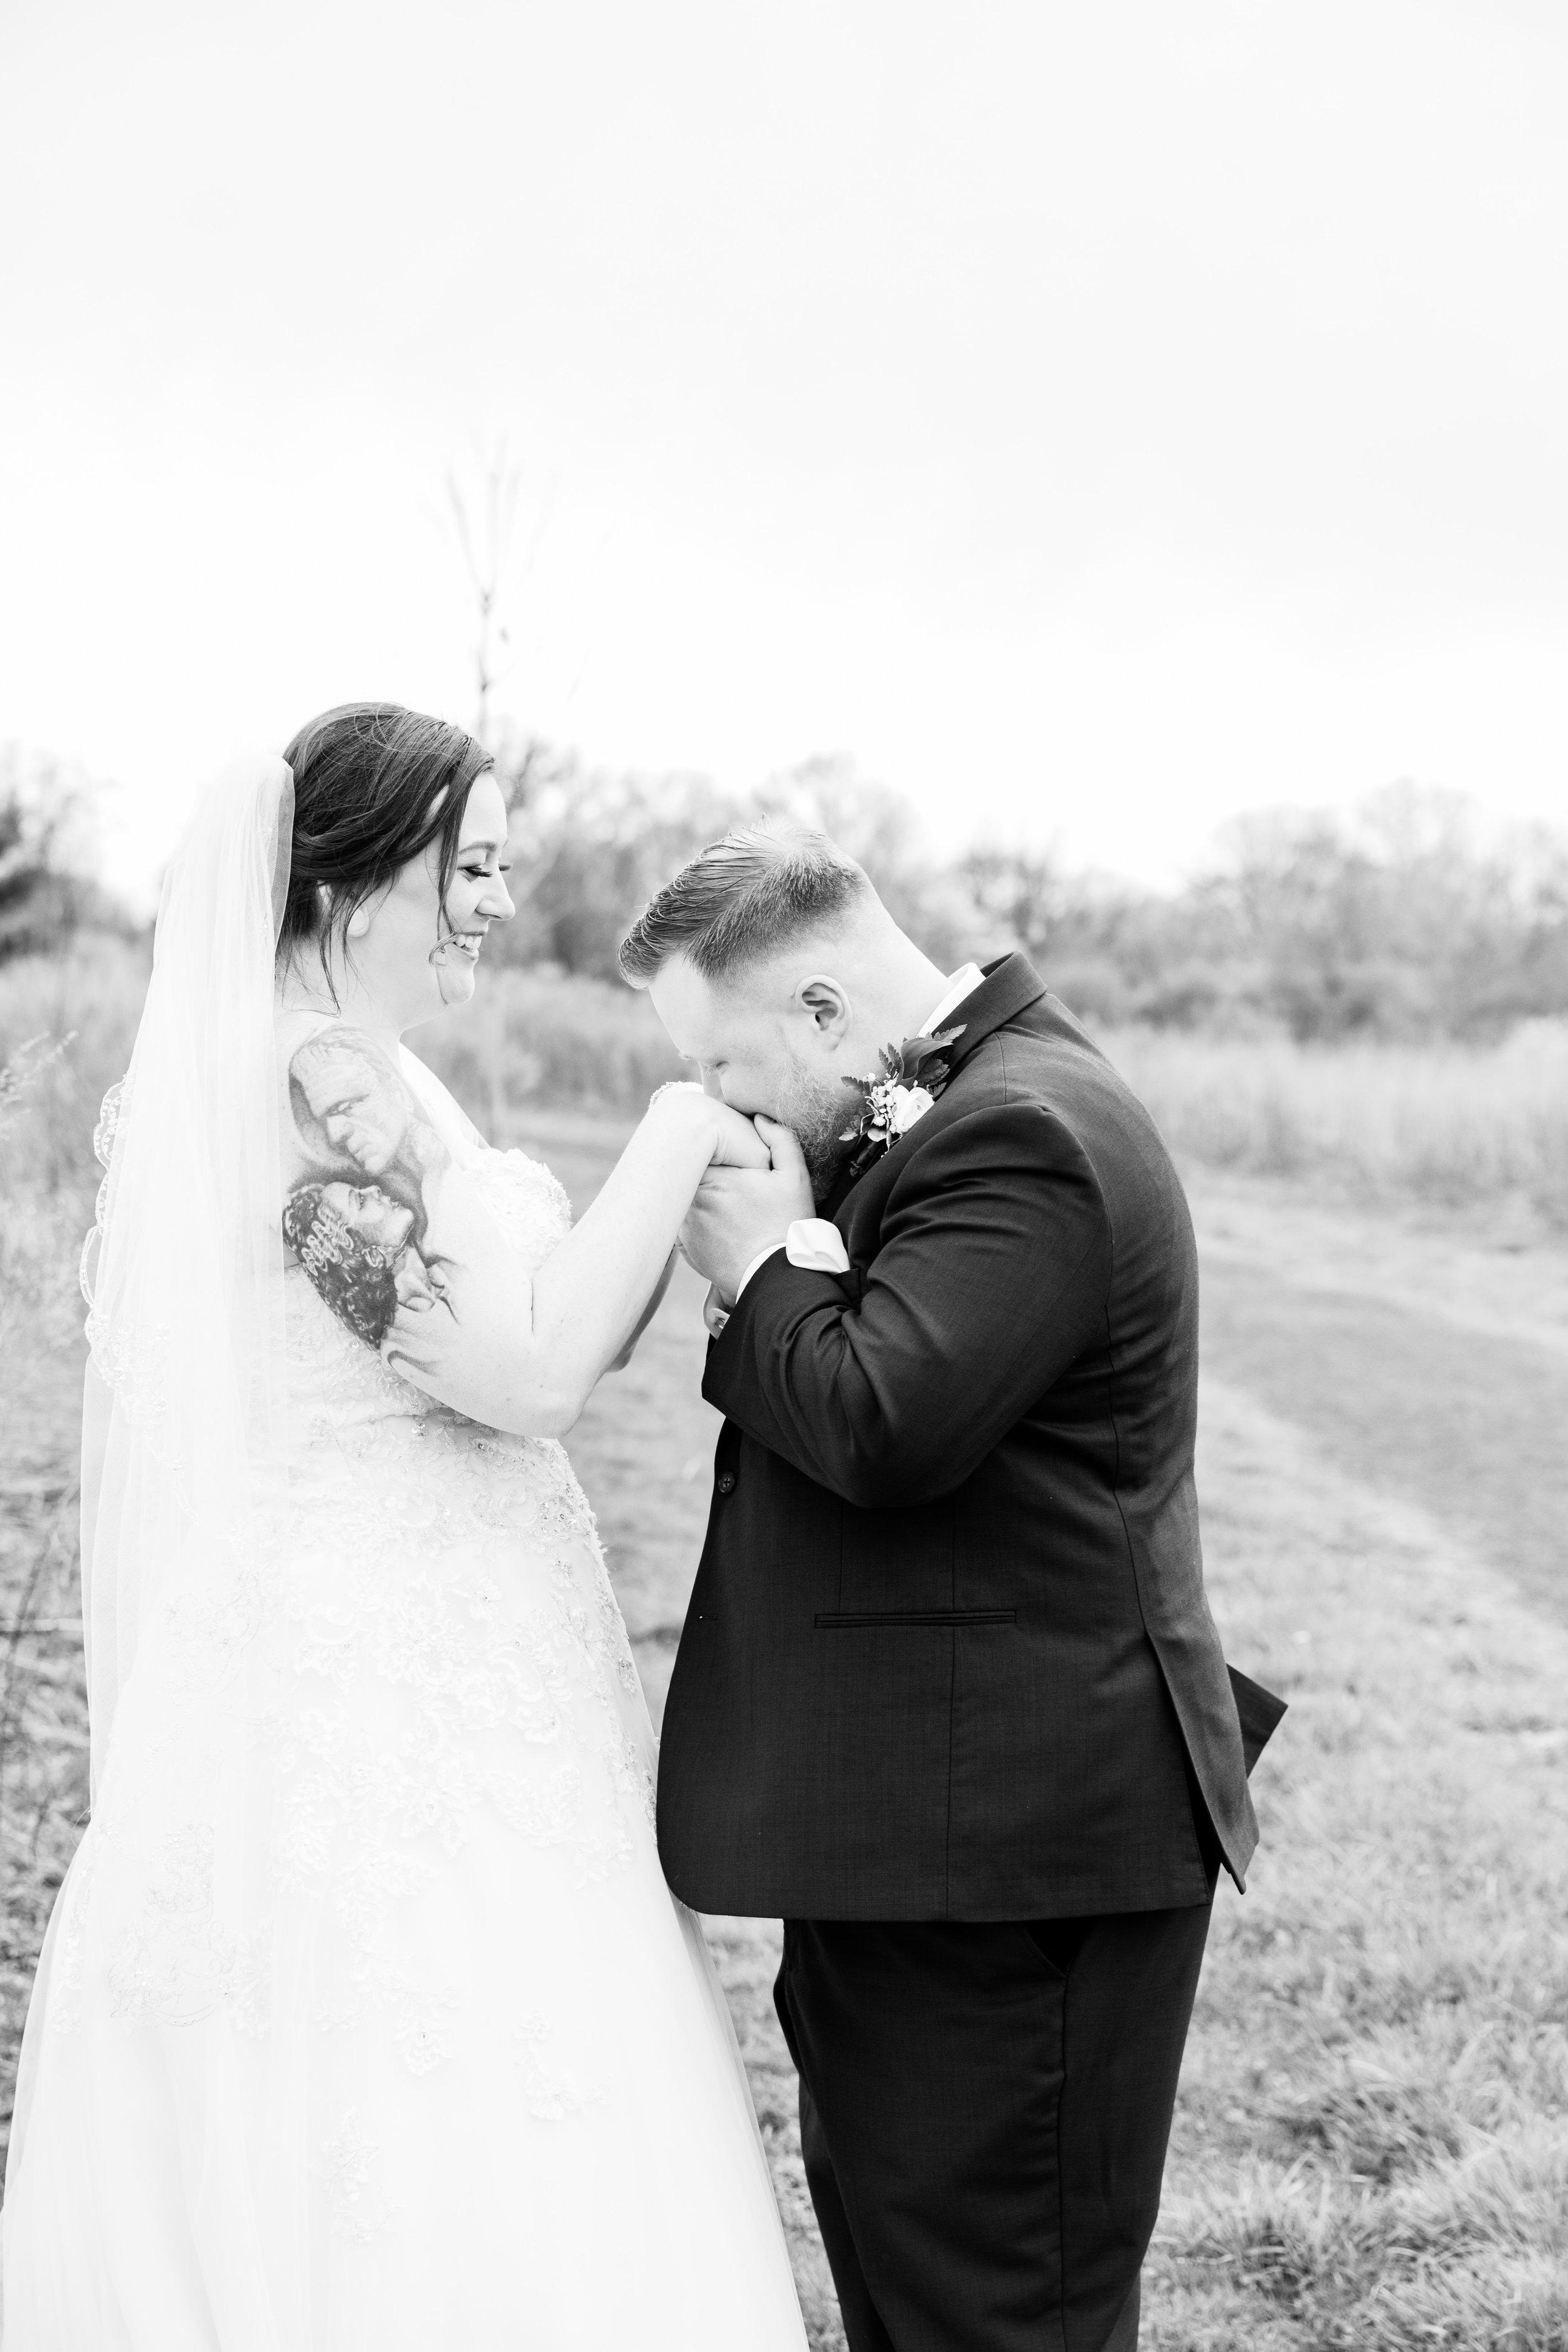 KRISTINA AND SHAWN - WATERFALL ROOM WEDDING - PHILADELPHIA-93.jpg